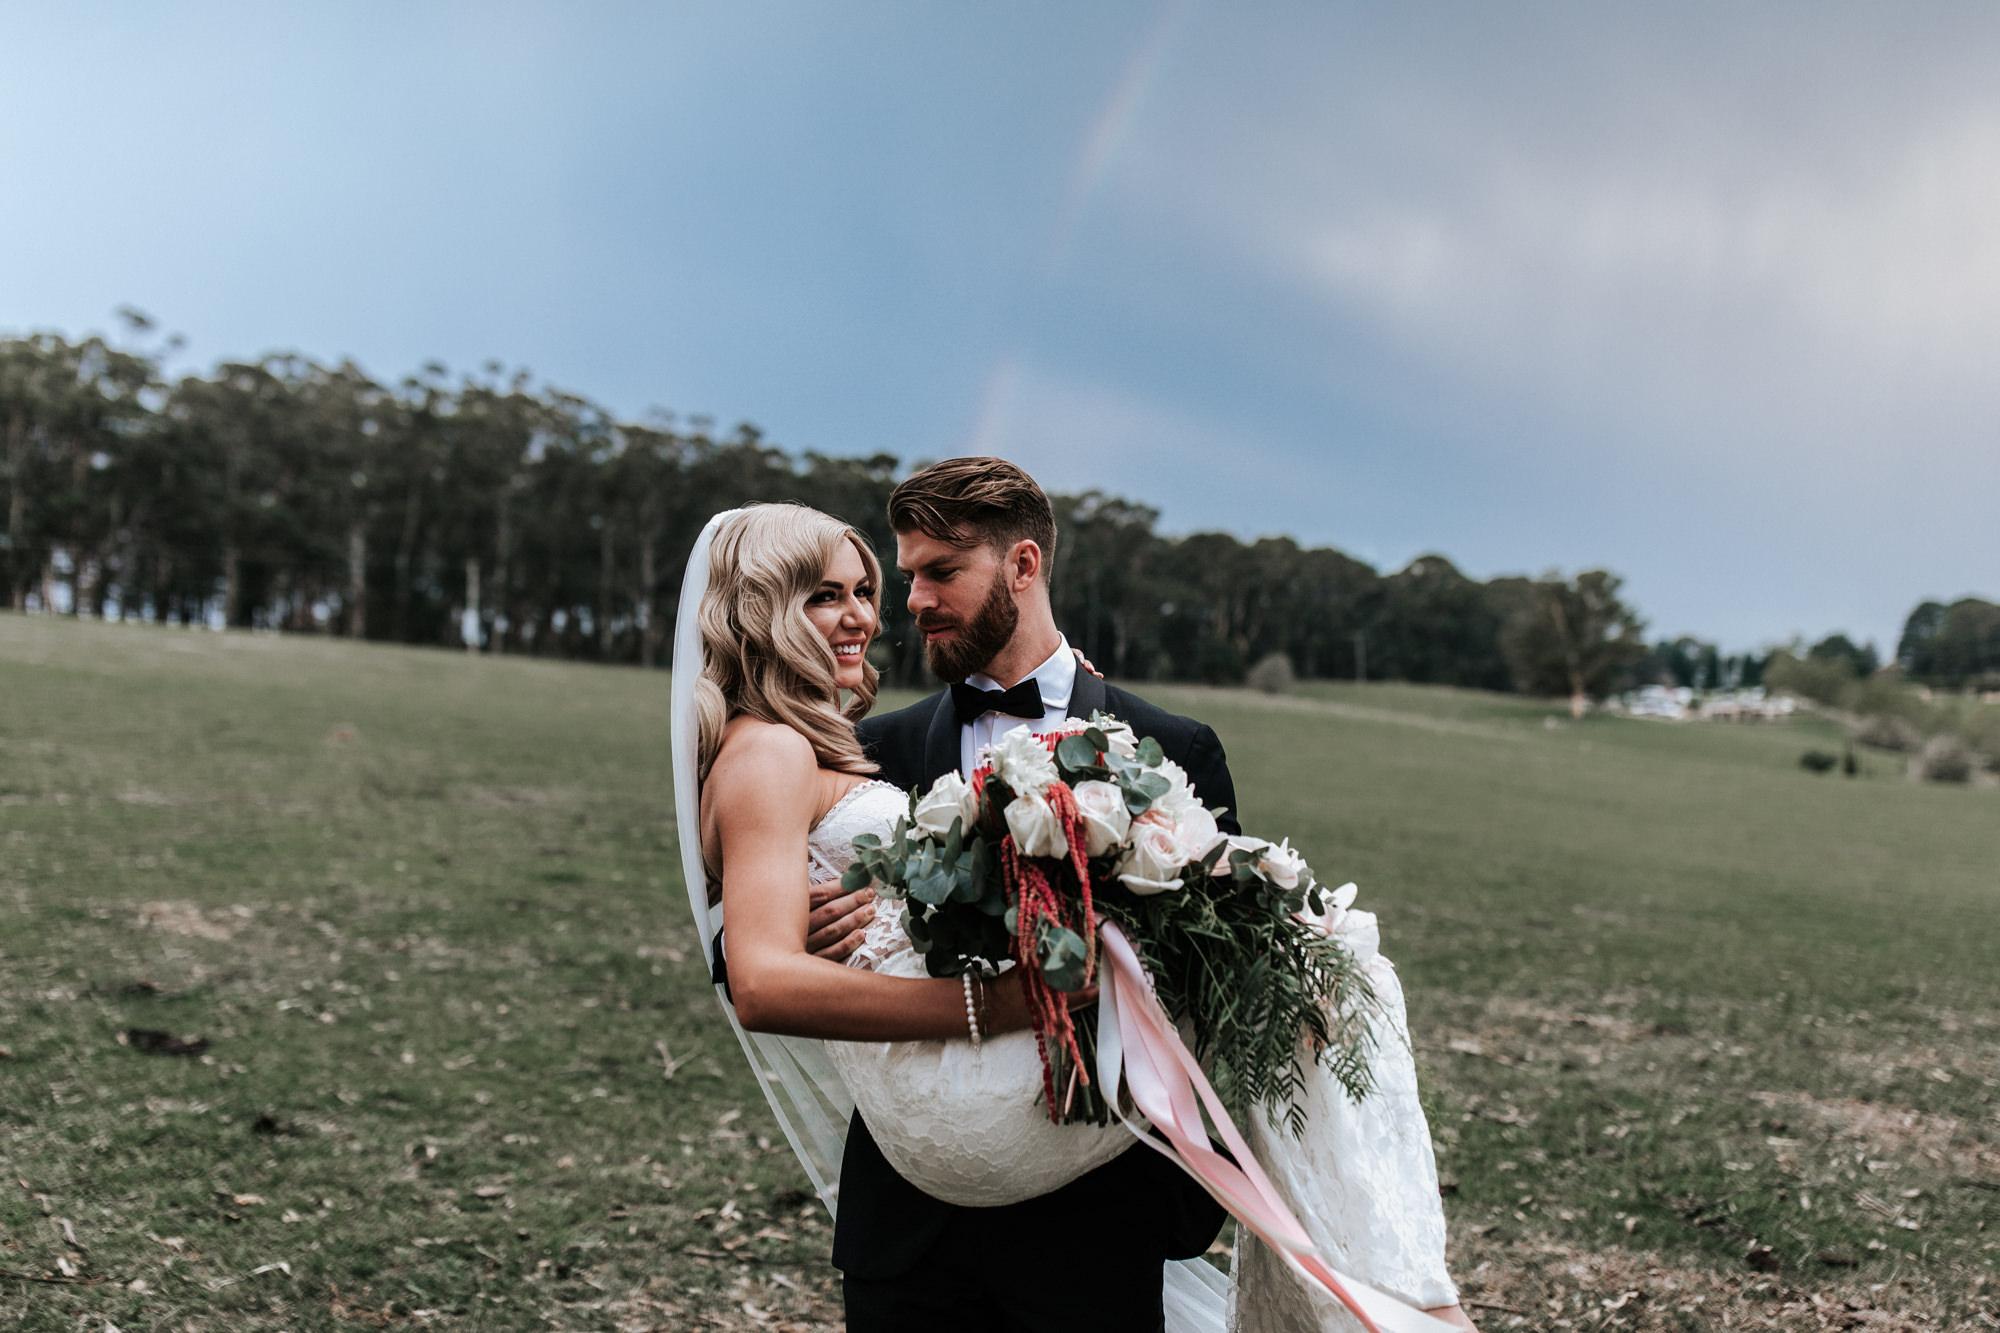 mali-brae-wedding-natalie-scott-baldwin-67.jpg